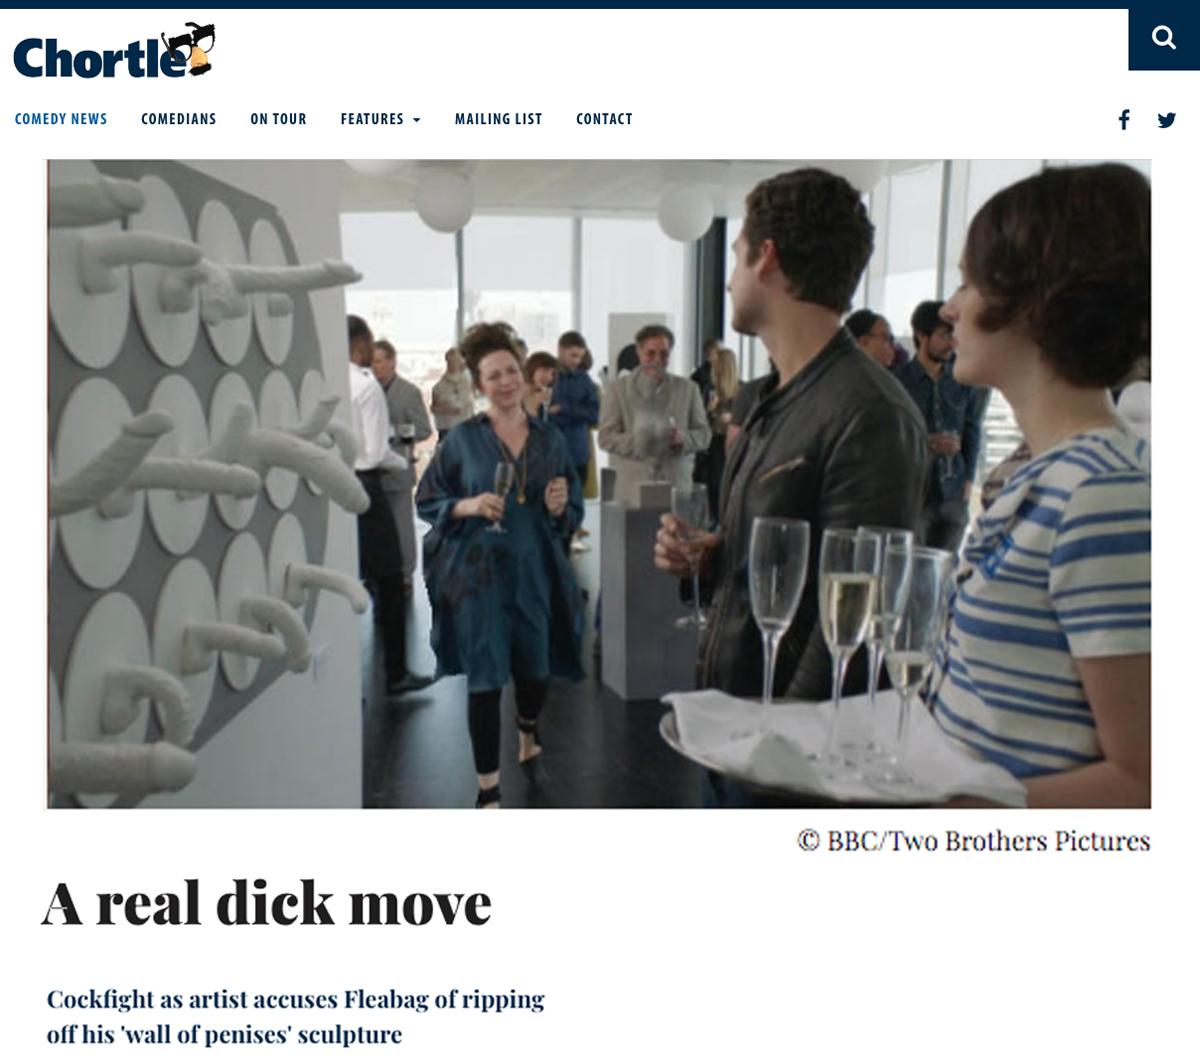 Chortle Comedy News on Fleabag copying Jamie McCartney's penis wall idea